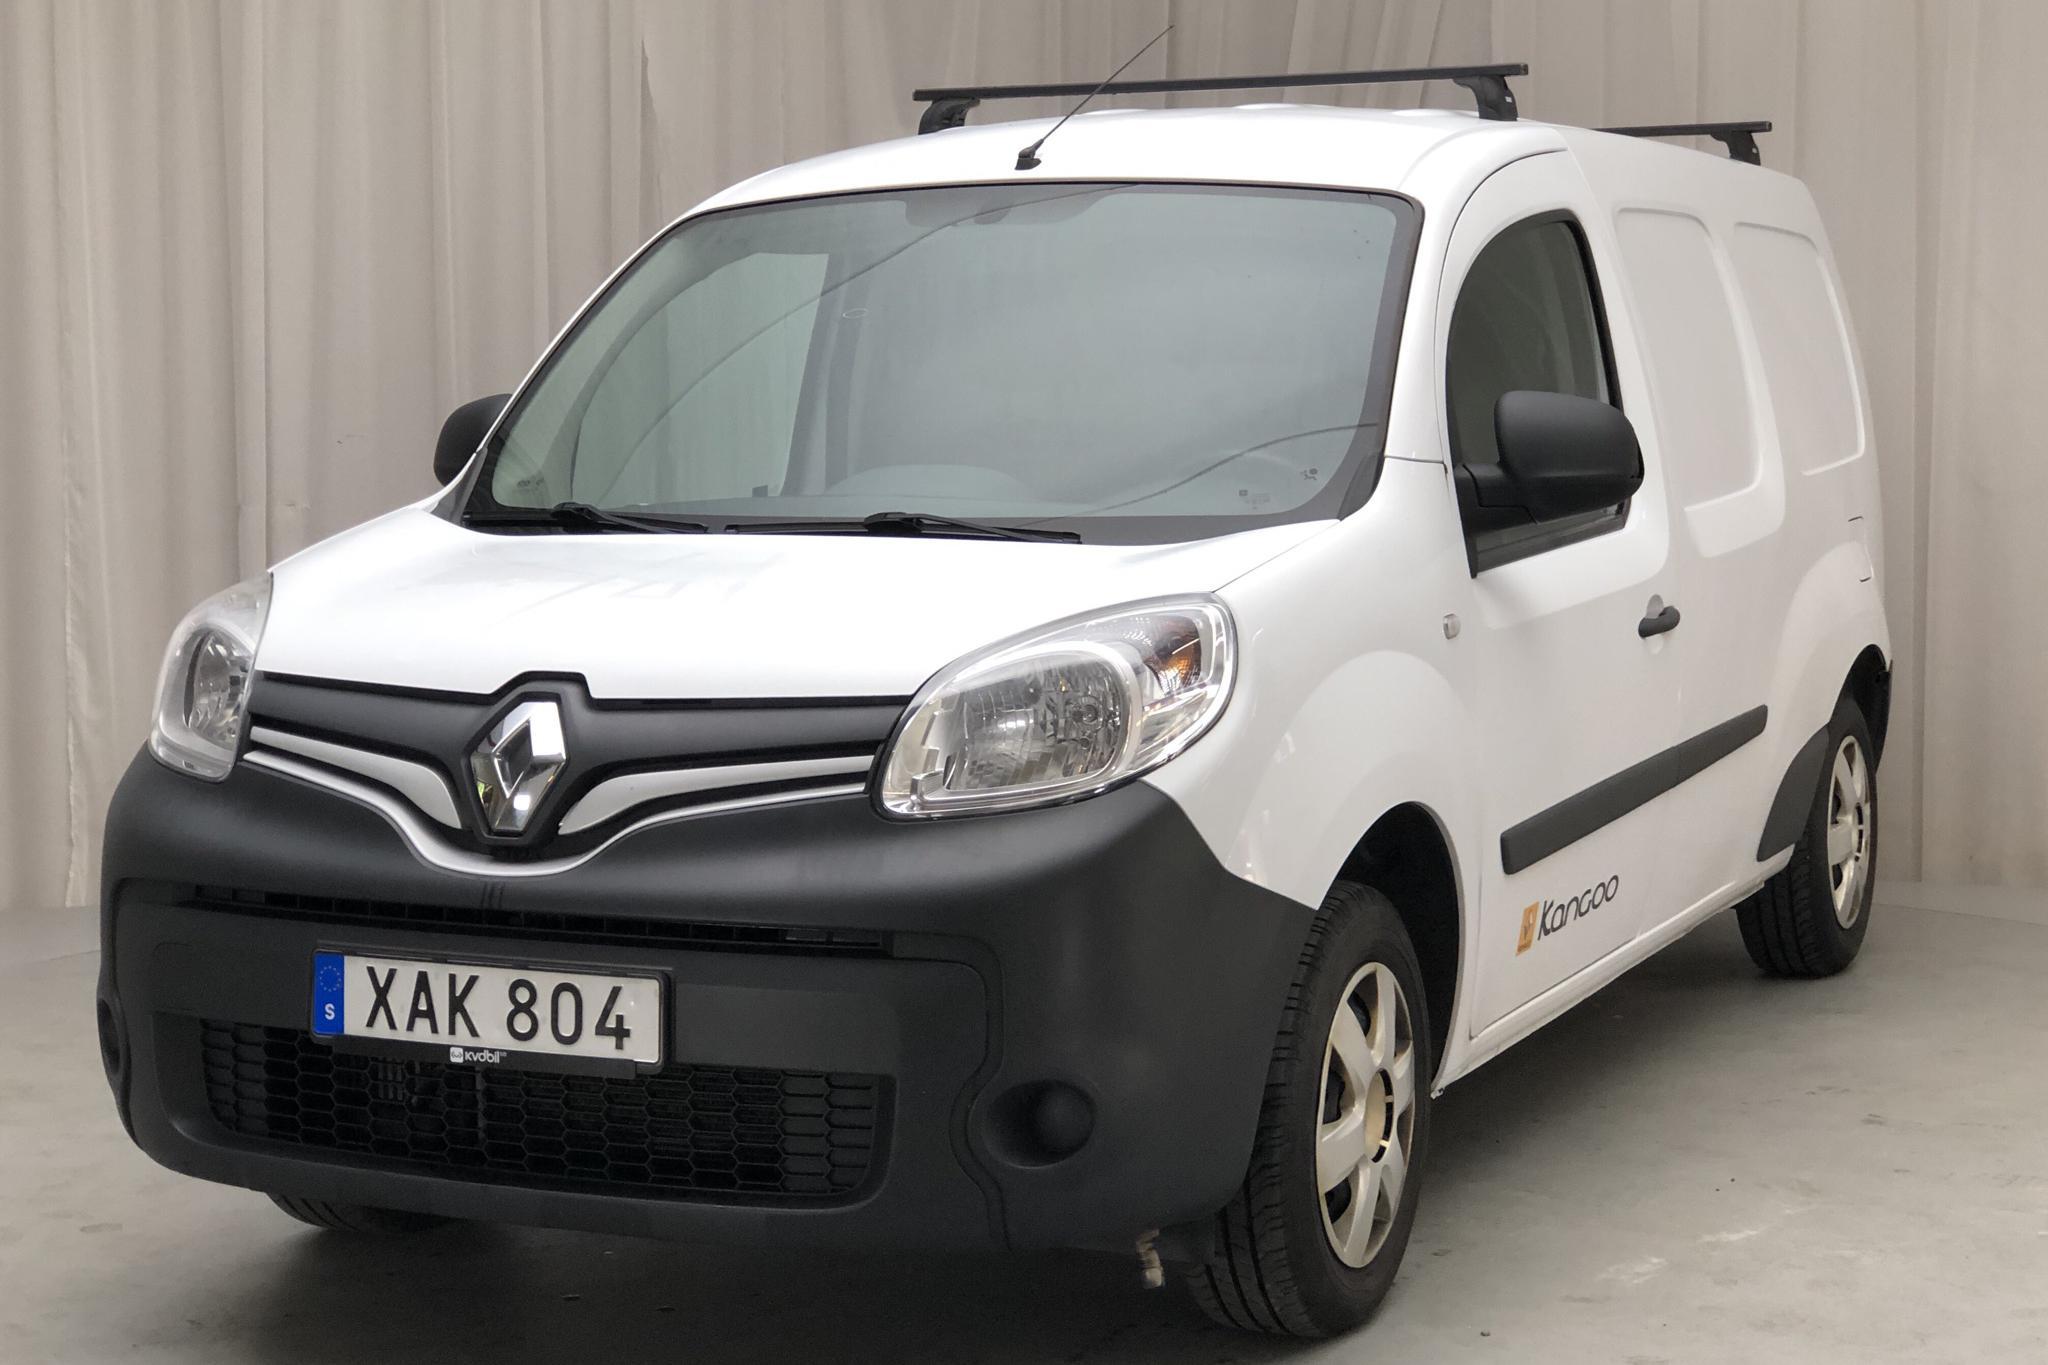 Renault Kangoo 1.5 dCi Maxi Skåp (110hk) - 8 368 mil - Manuell - vit - 2015